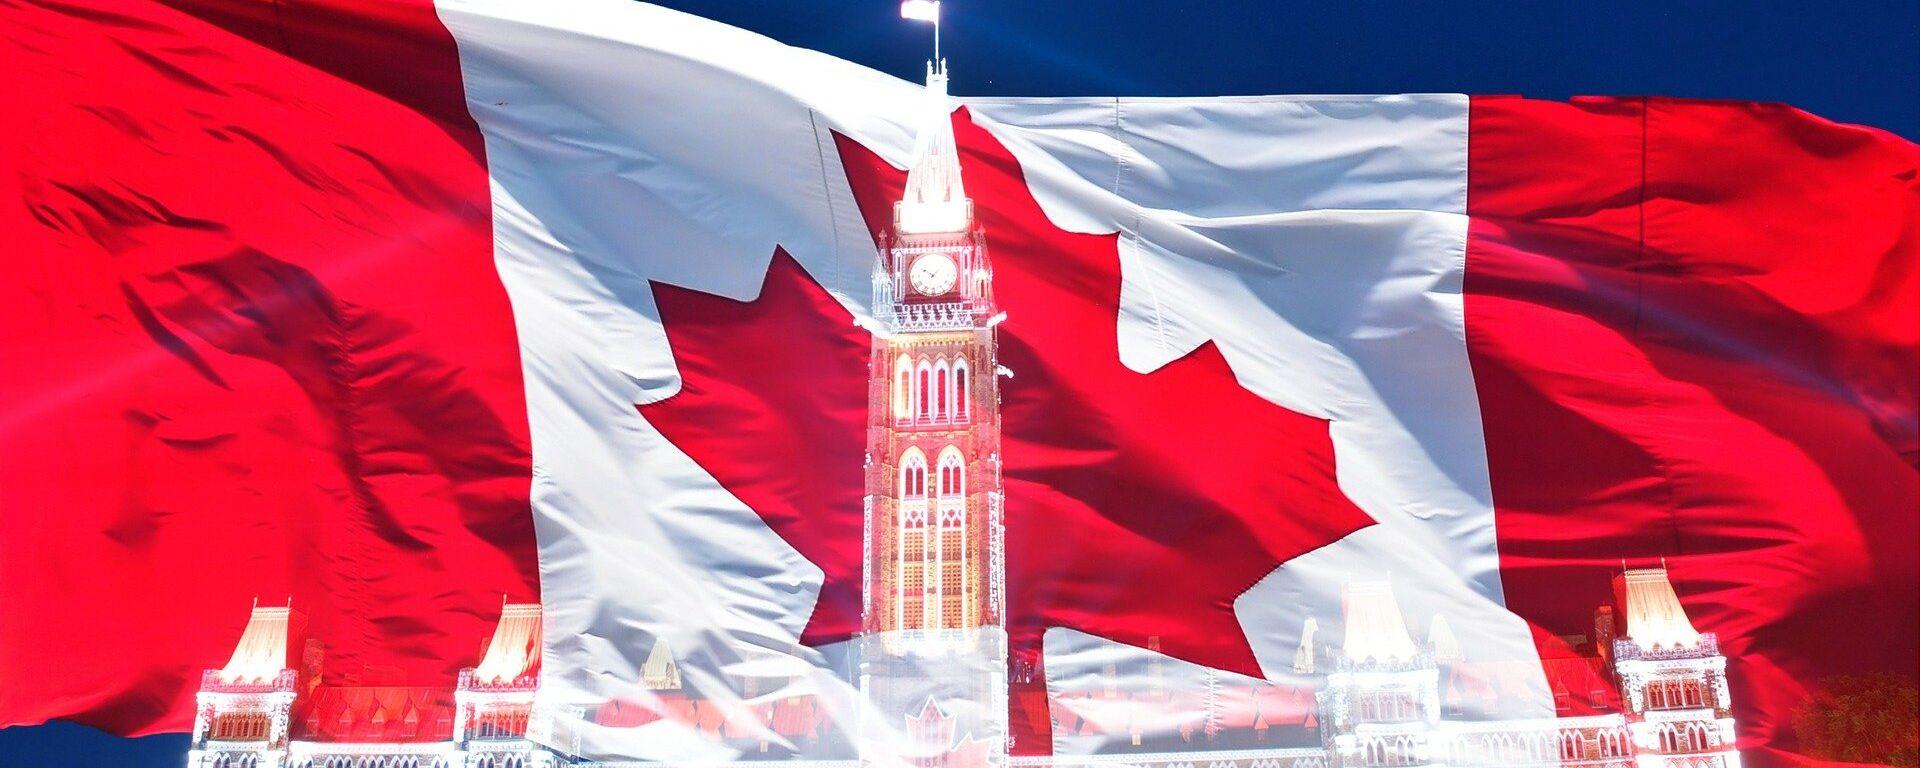 La bandera de Canadá - Sputnik Mundo, 1920, 26.09.2020